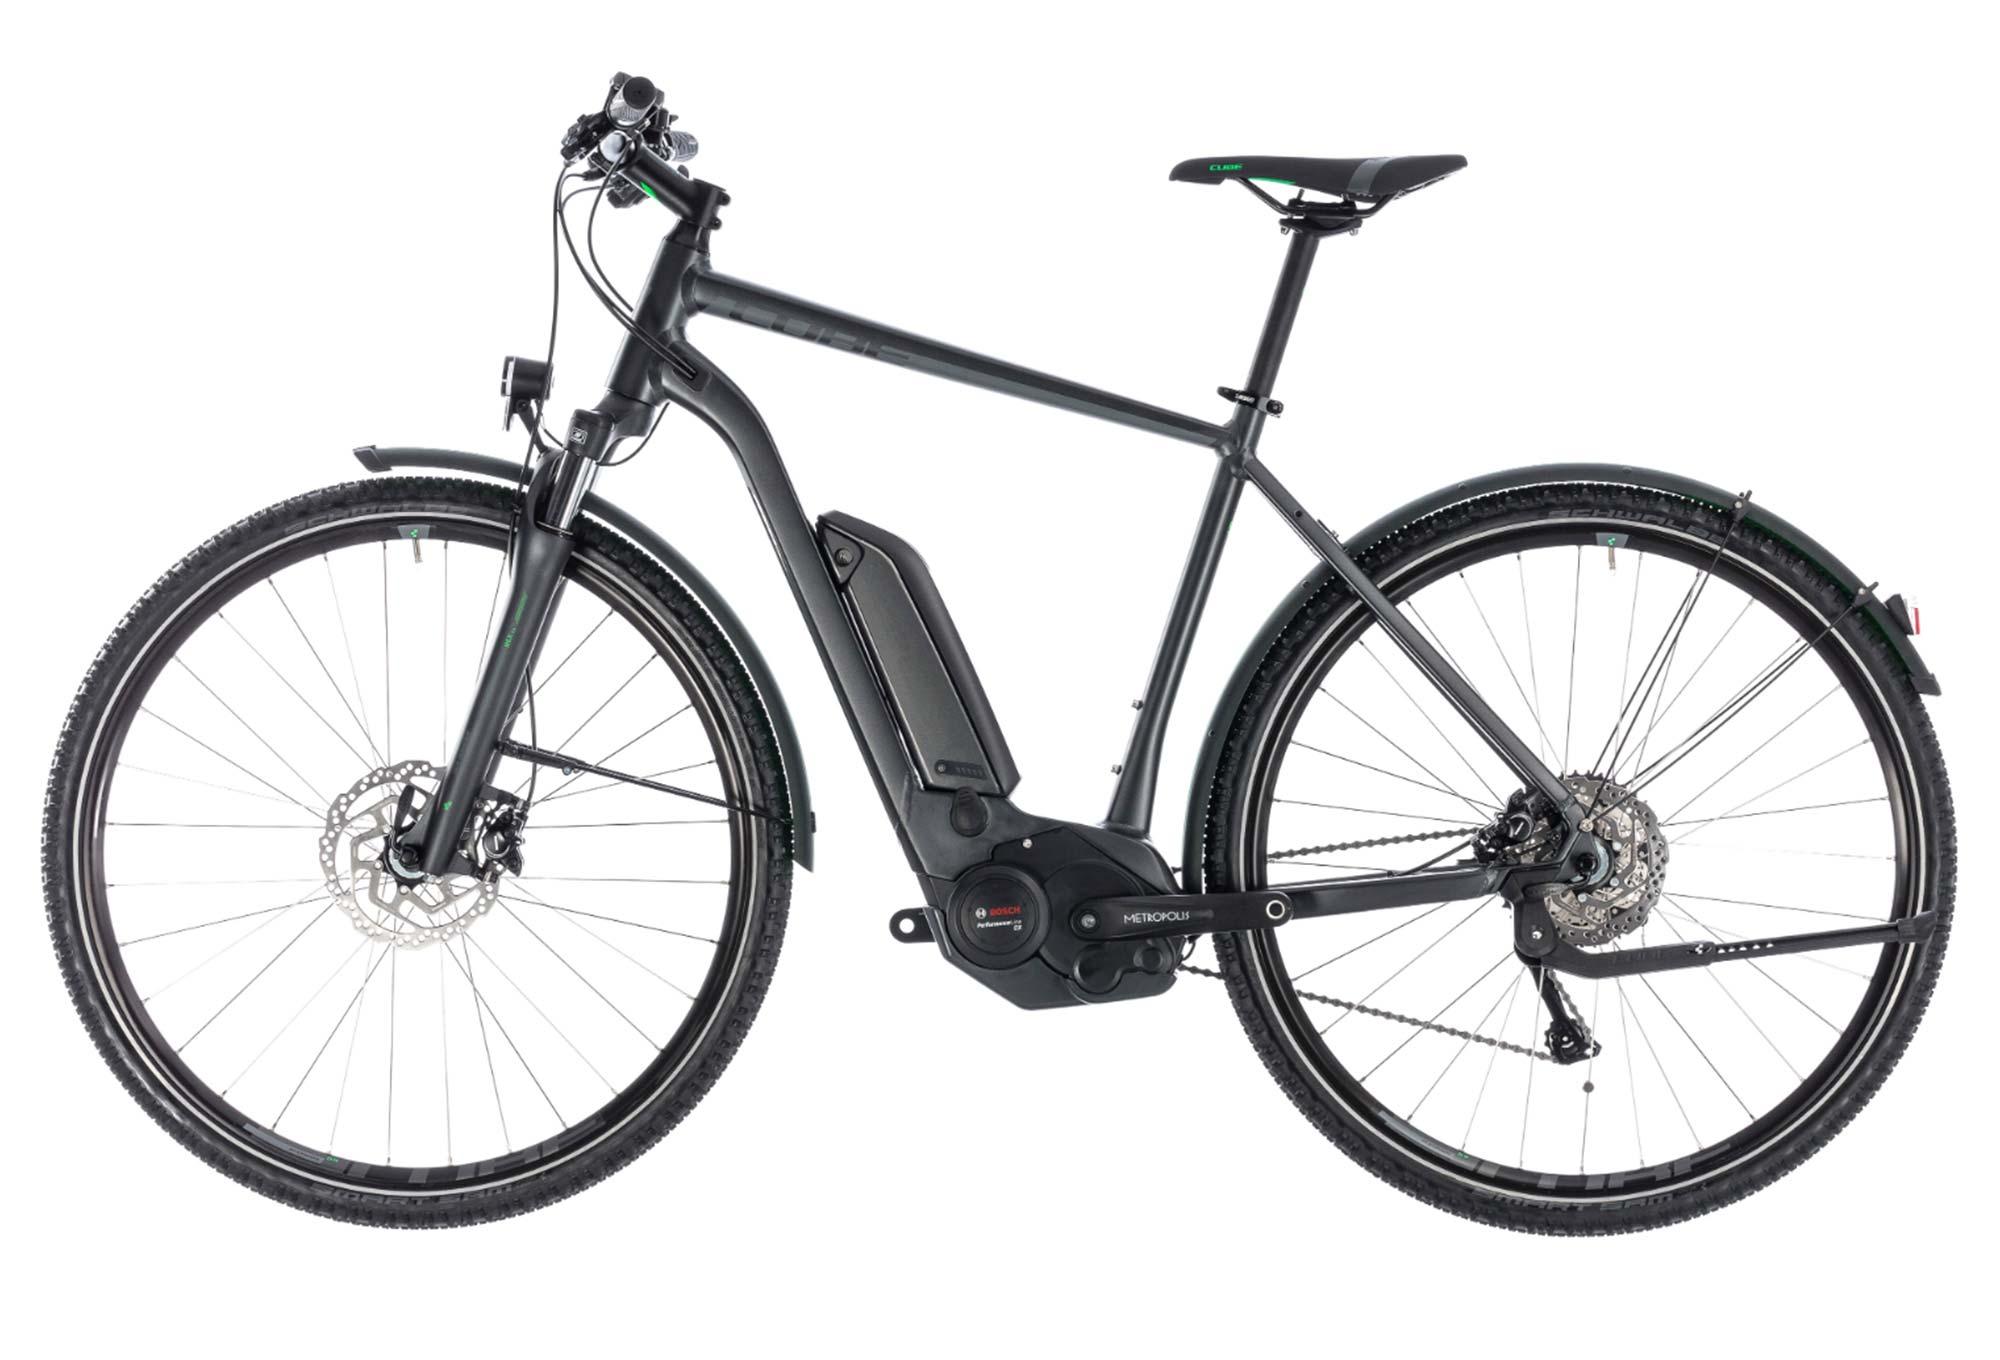 Cube Cross Hybrid Pro Allroad 500 Hybrid Touring Bike 700 Mm Shimano Deore 10s Grey Green